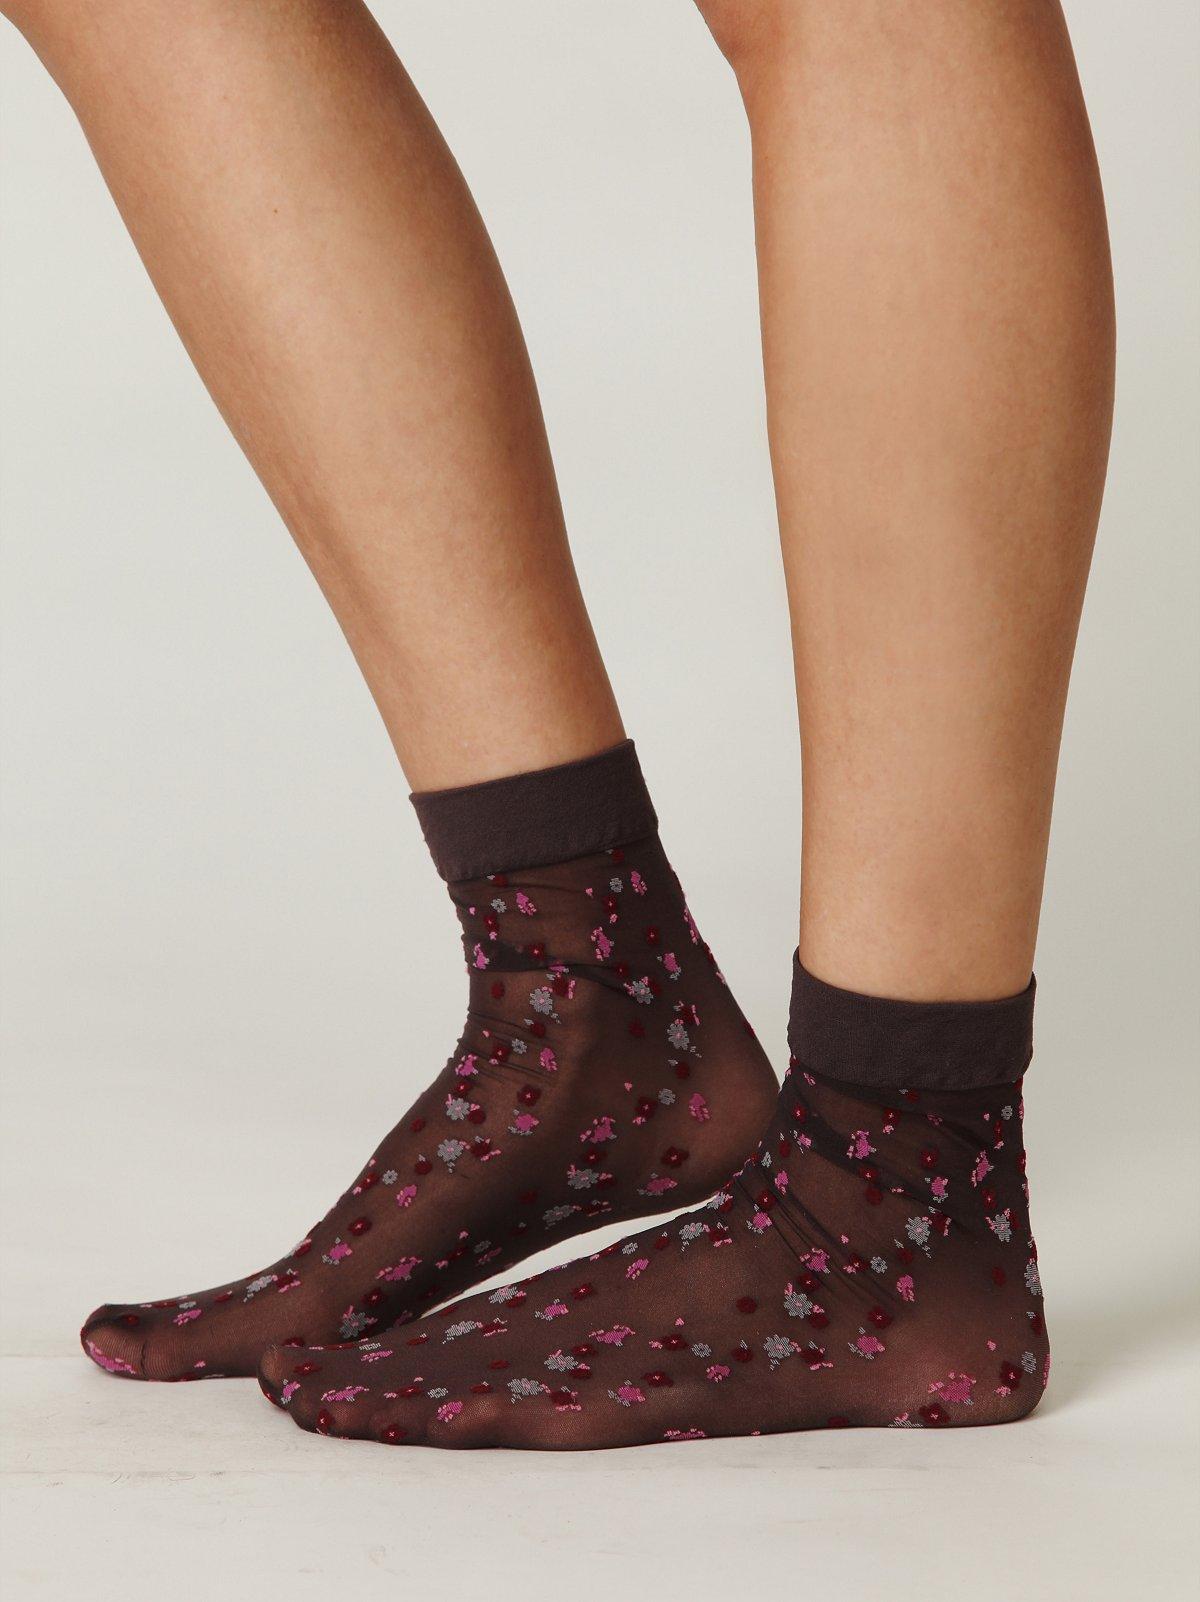 Sheer Ditsy Ankle Sock